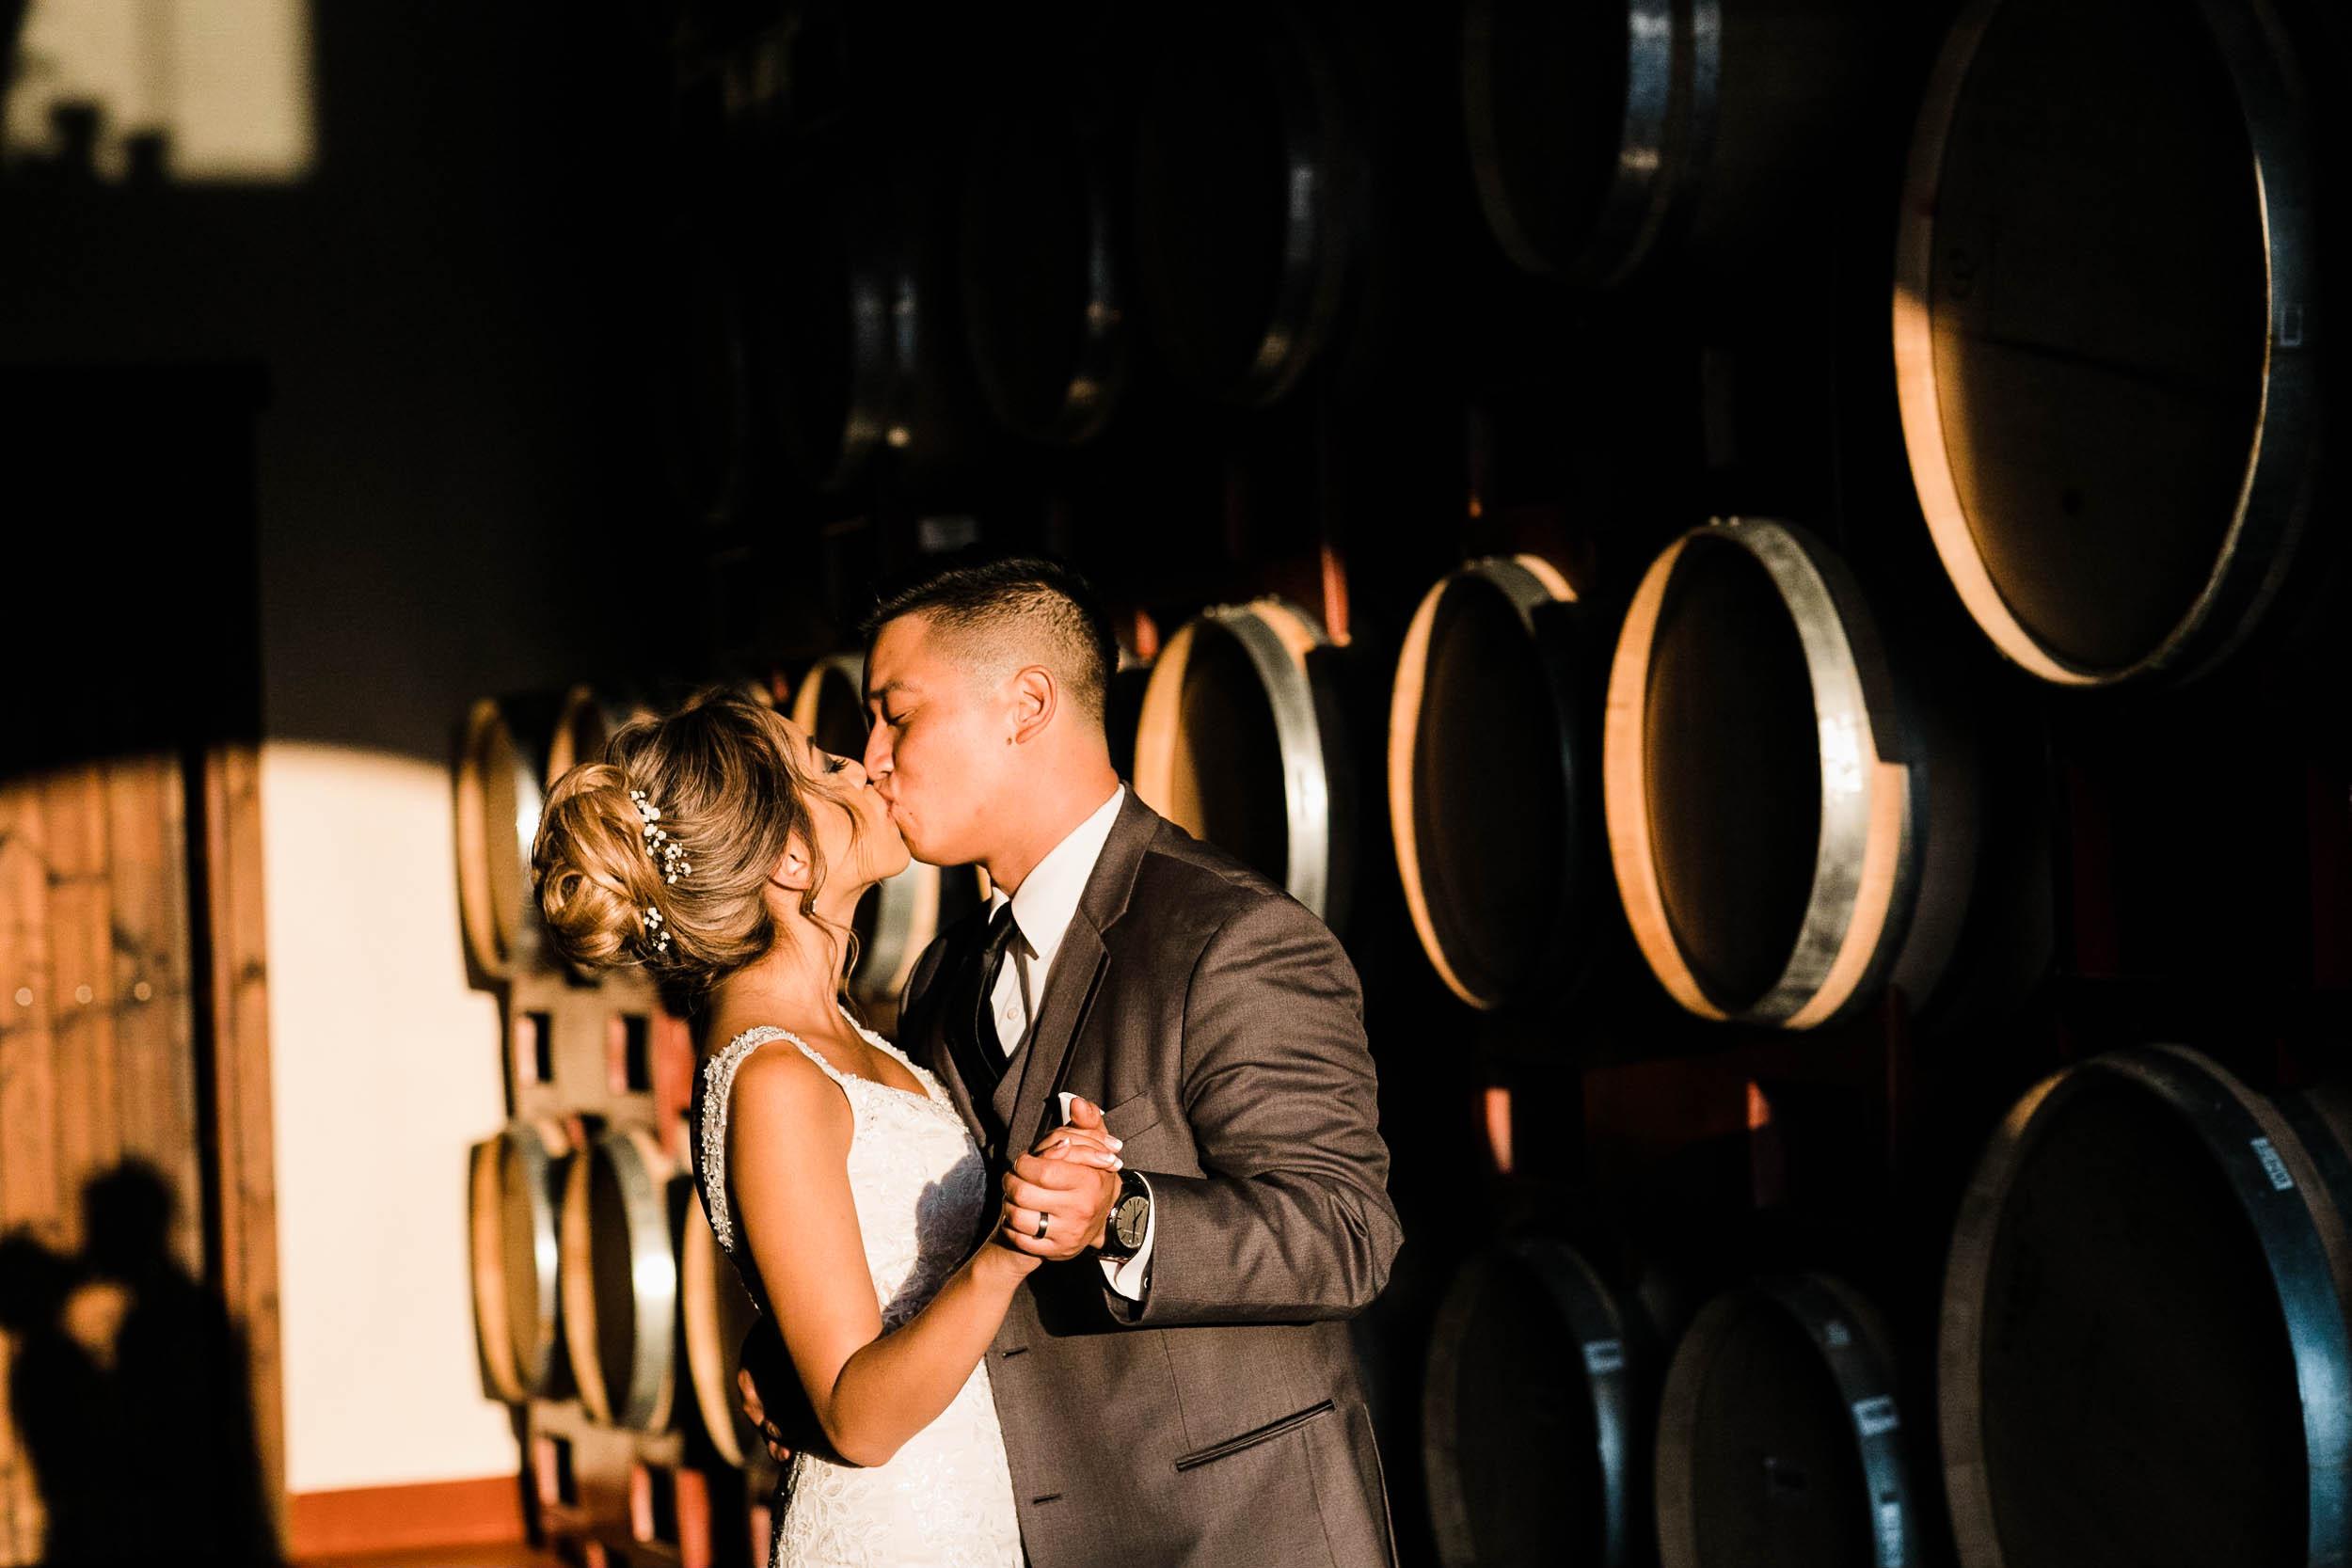 Las Positas Wedding_Buena Lane Photography_090118ER684.jpg